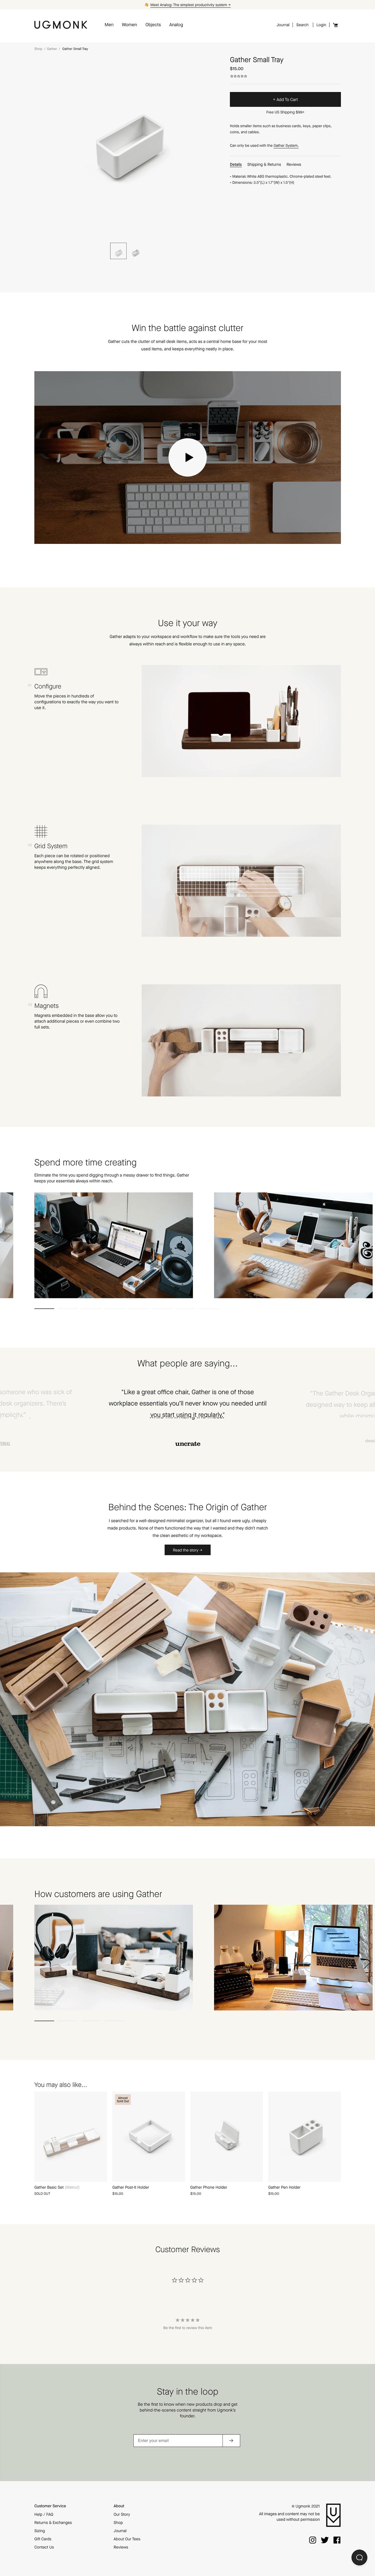 Ugmonk Ecommerce Product Page